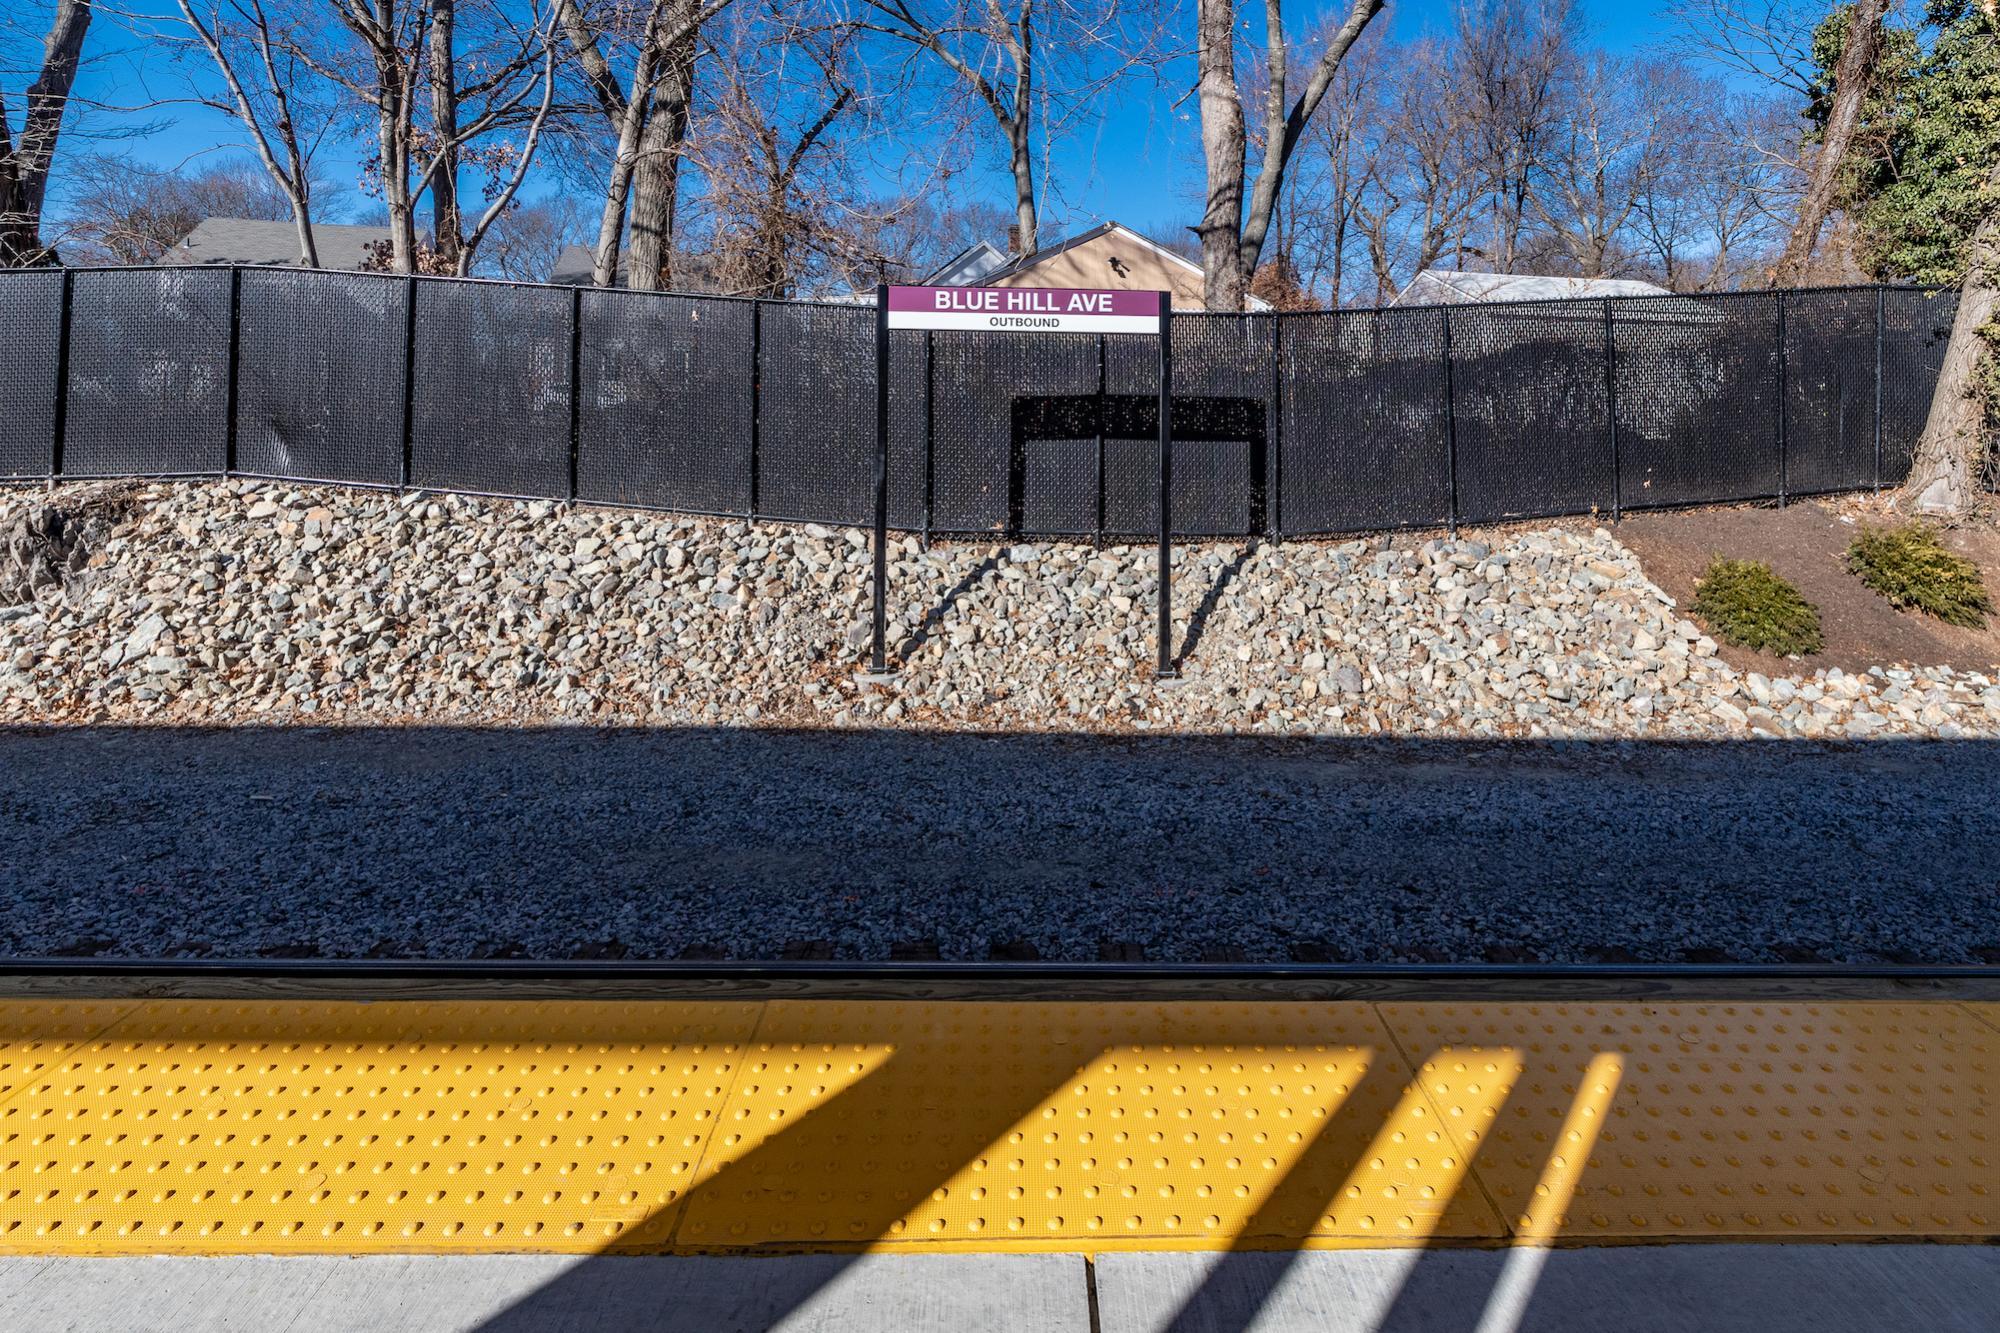 Station sign along the tracks (January 2019)